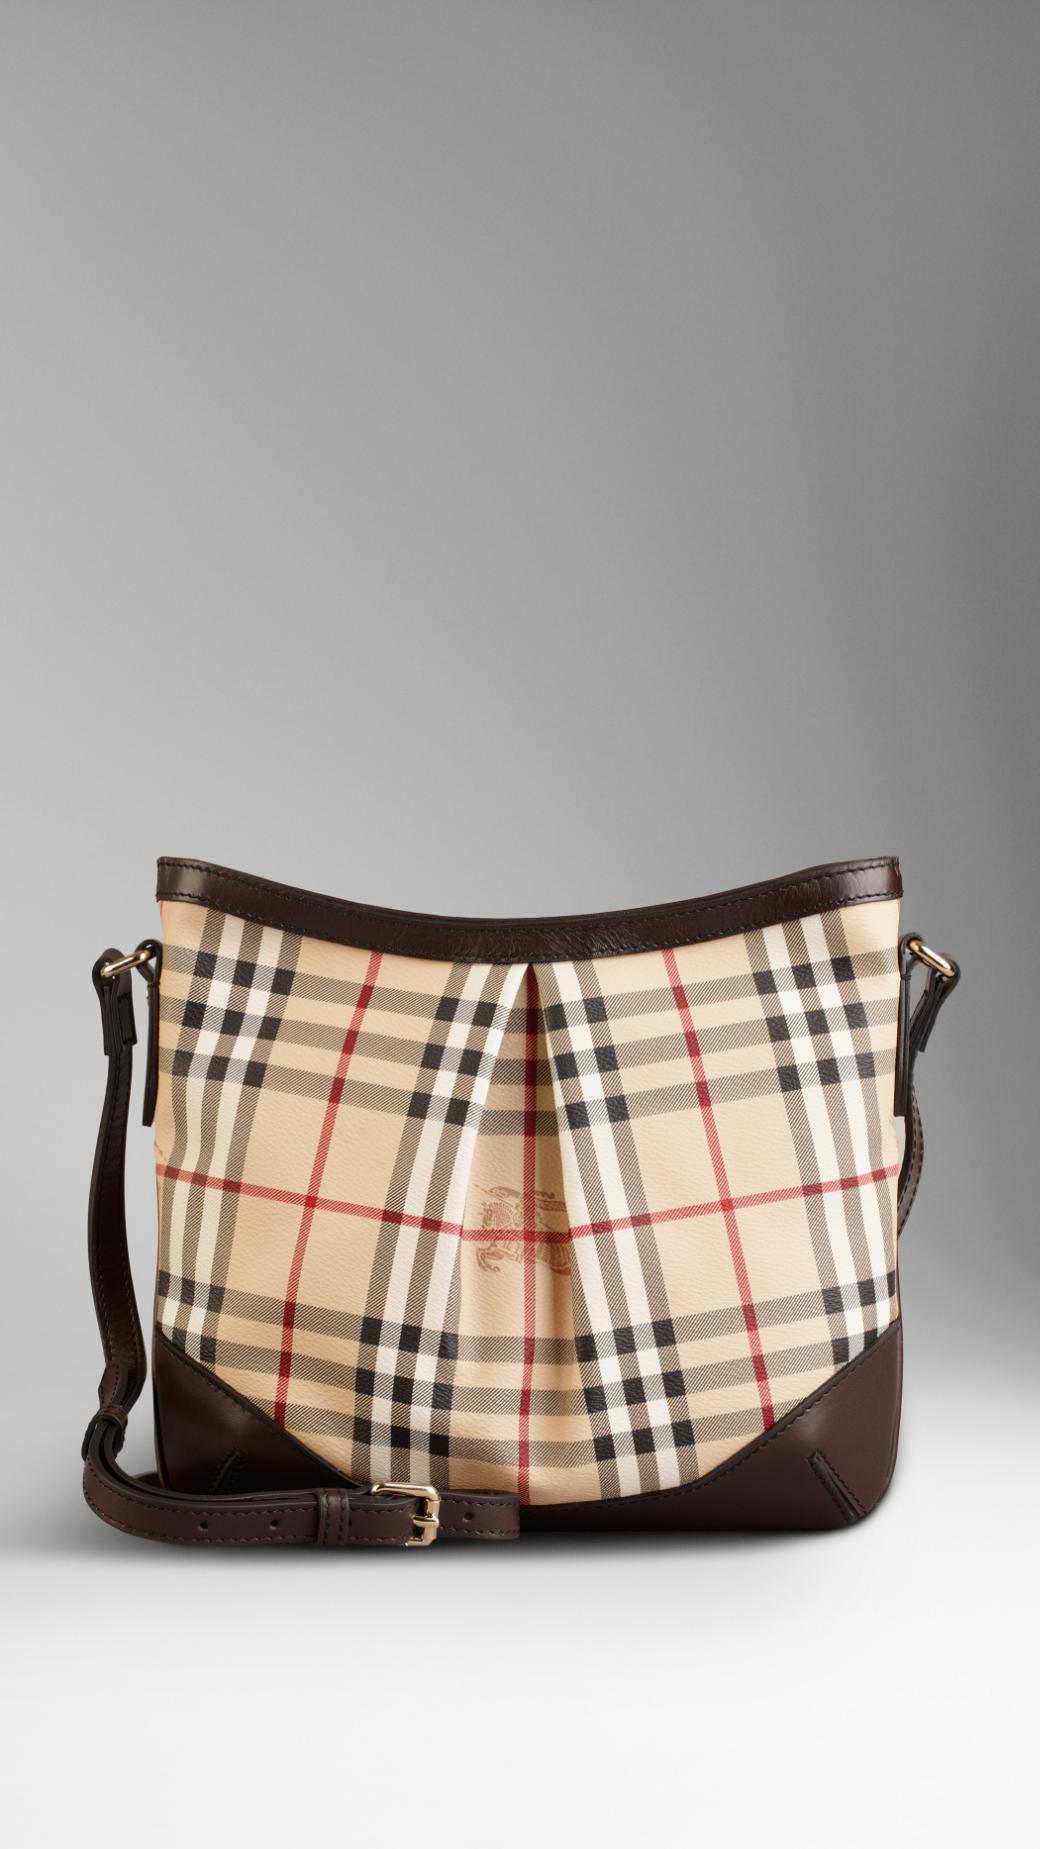 2eac92d5d7 Burberry Medium Haymarket Check Crossbody Bag in Brown - Lyst